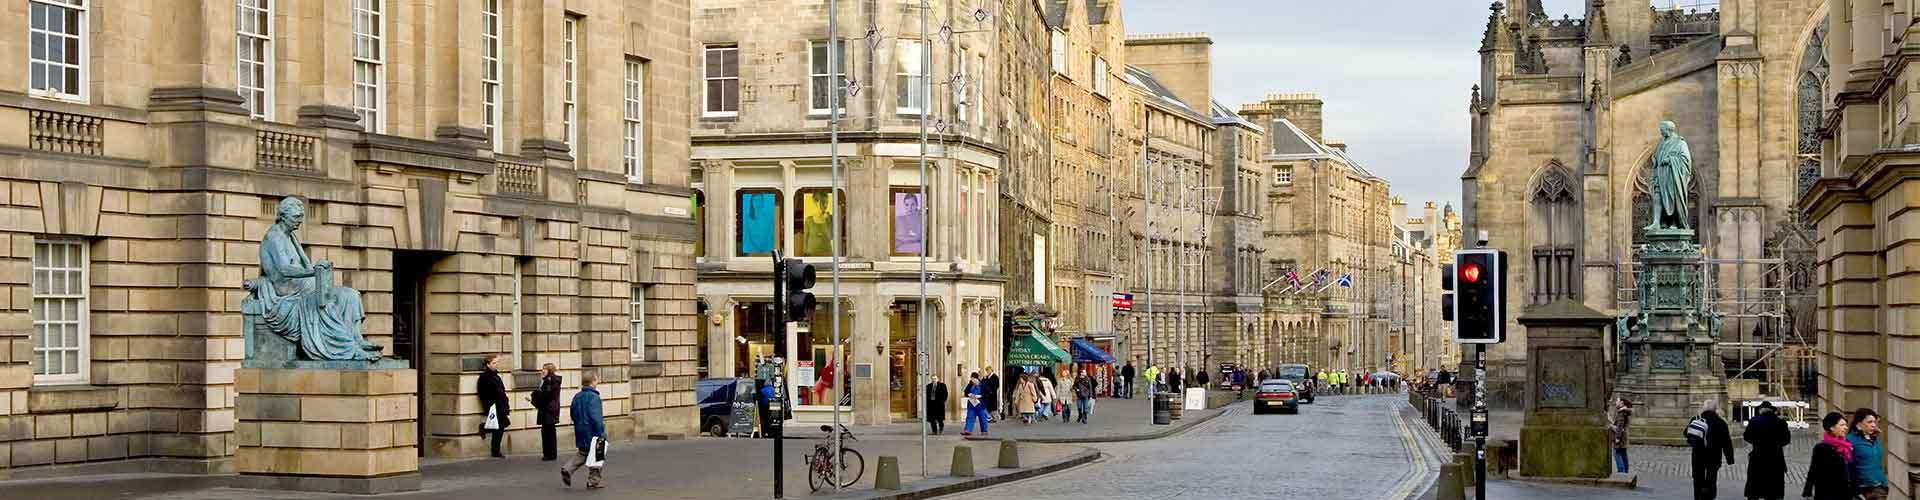 Edimburgo - Hoteles baratos en el distrito The High Street. Mapas de Edimburgo, Fotos y comentarios de cada Hotel barato en Edimburgo.